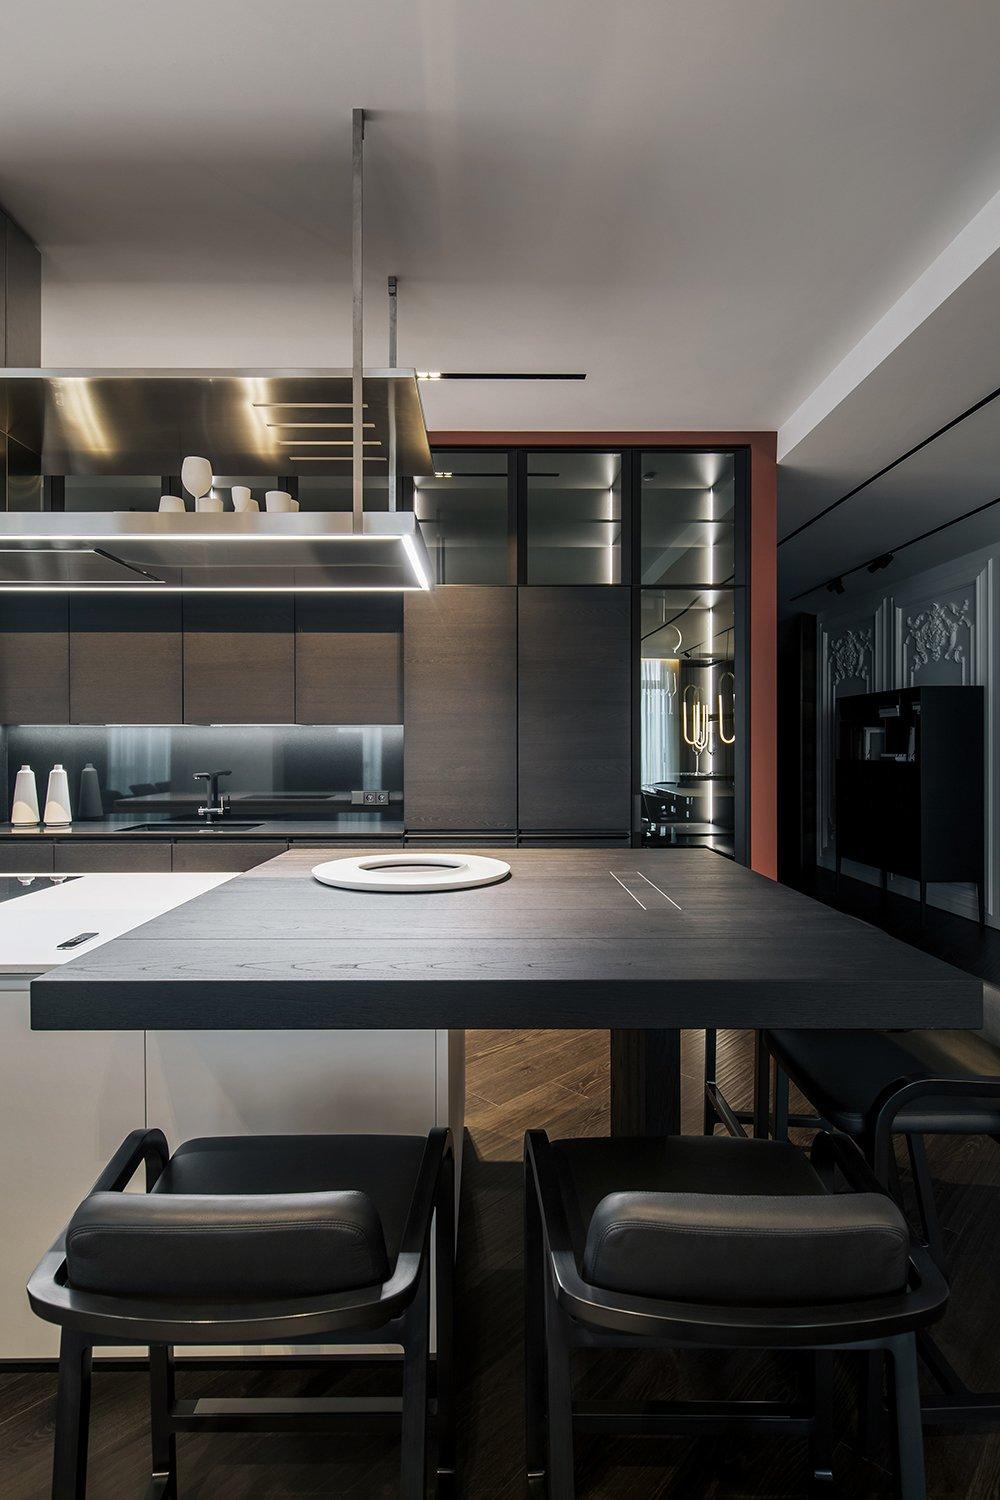 Kitchen, Cooktops, Beverage Center, Wood, Wood, Colorful, and Dark Hardwood  Best Kitchen Wood Wood Dark Hardwood Photos from Diamond apartment